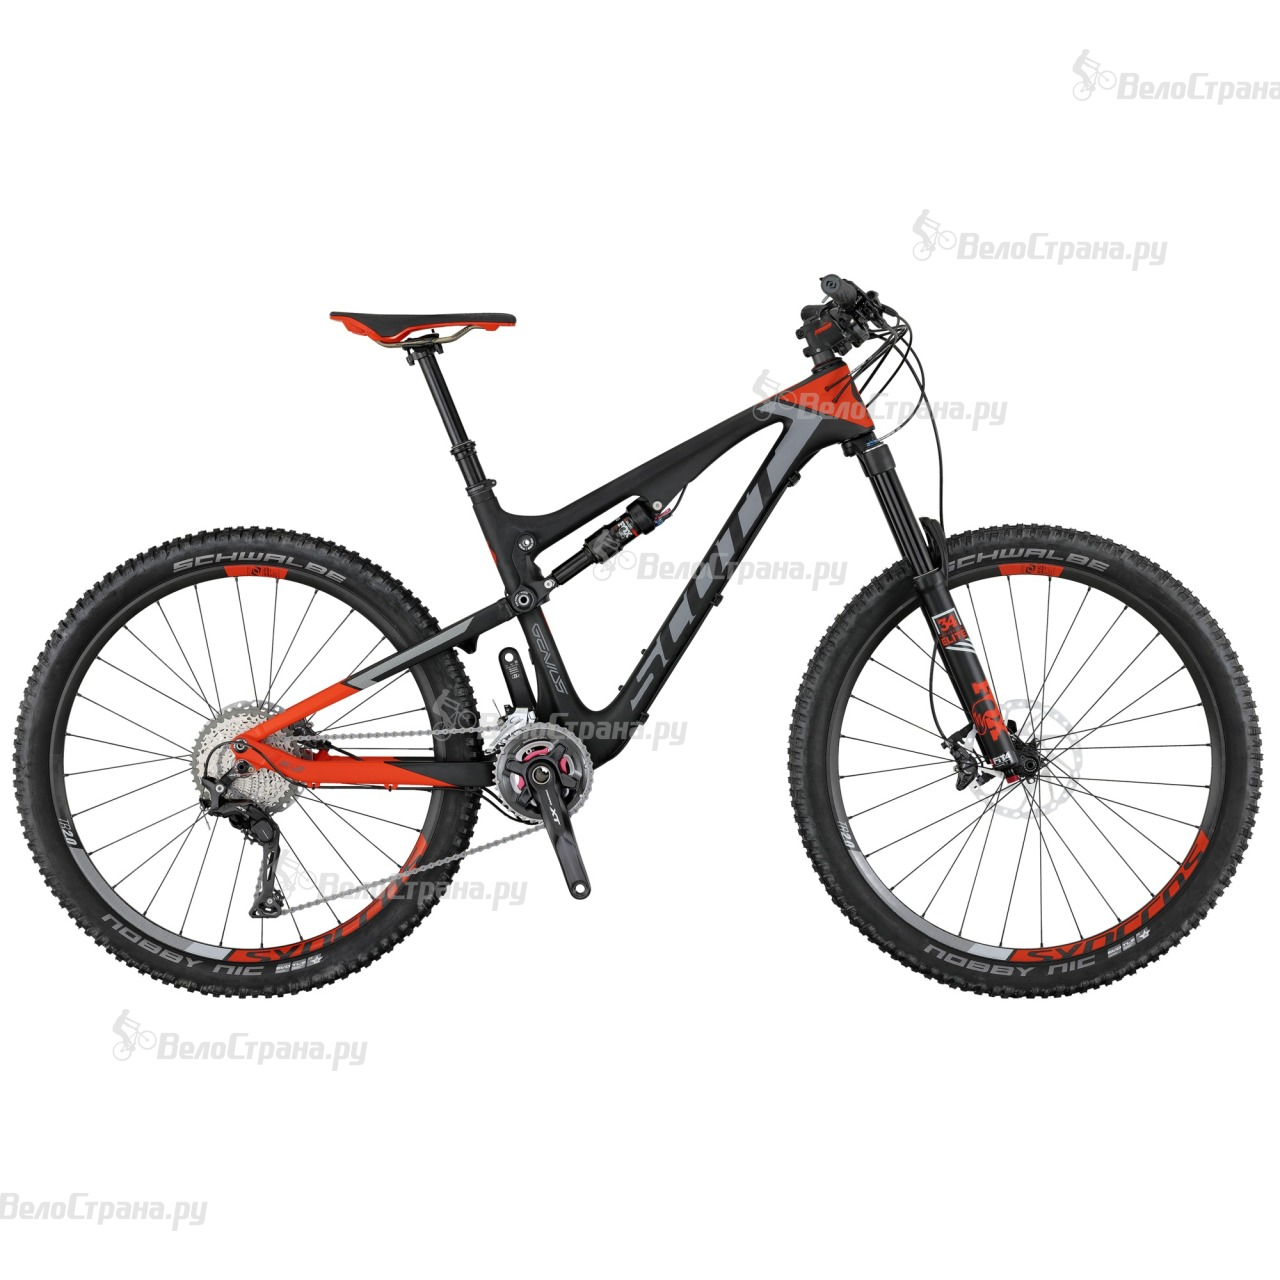 Велосипед Scott Genius 710 (2017) genius hs 300a silver